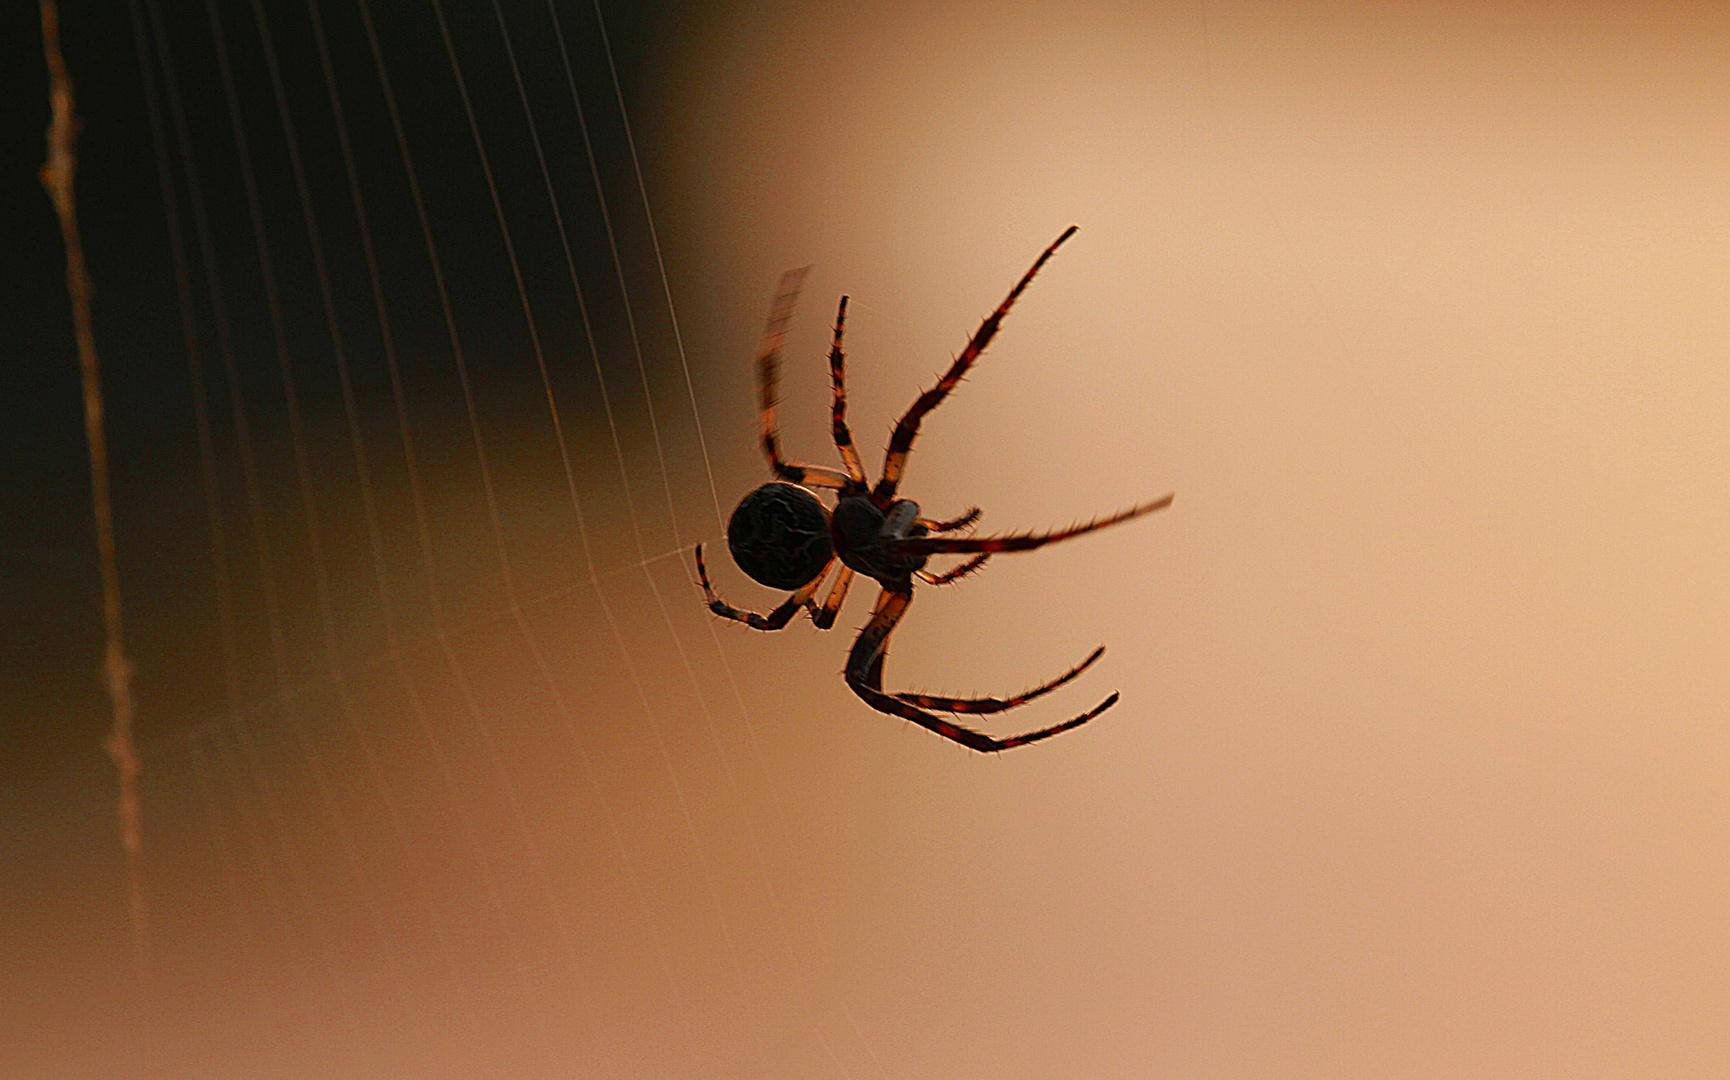 Spinne 1